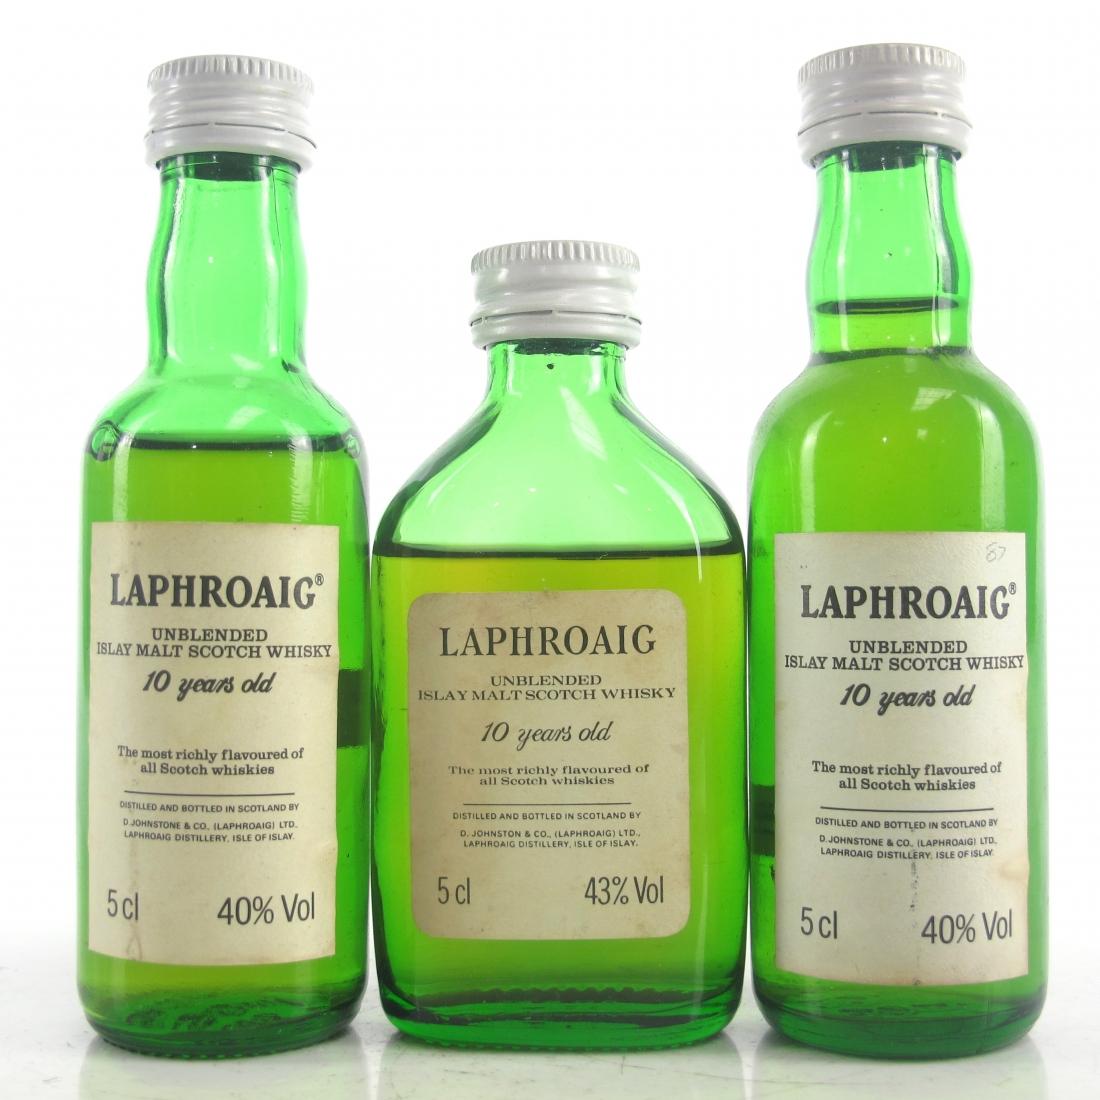 Laphroaig 10 Year Old Miniatures 3 x 5cl 1980s